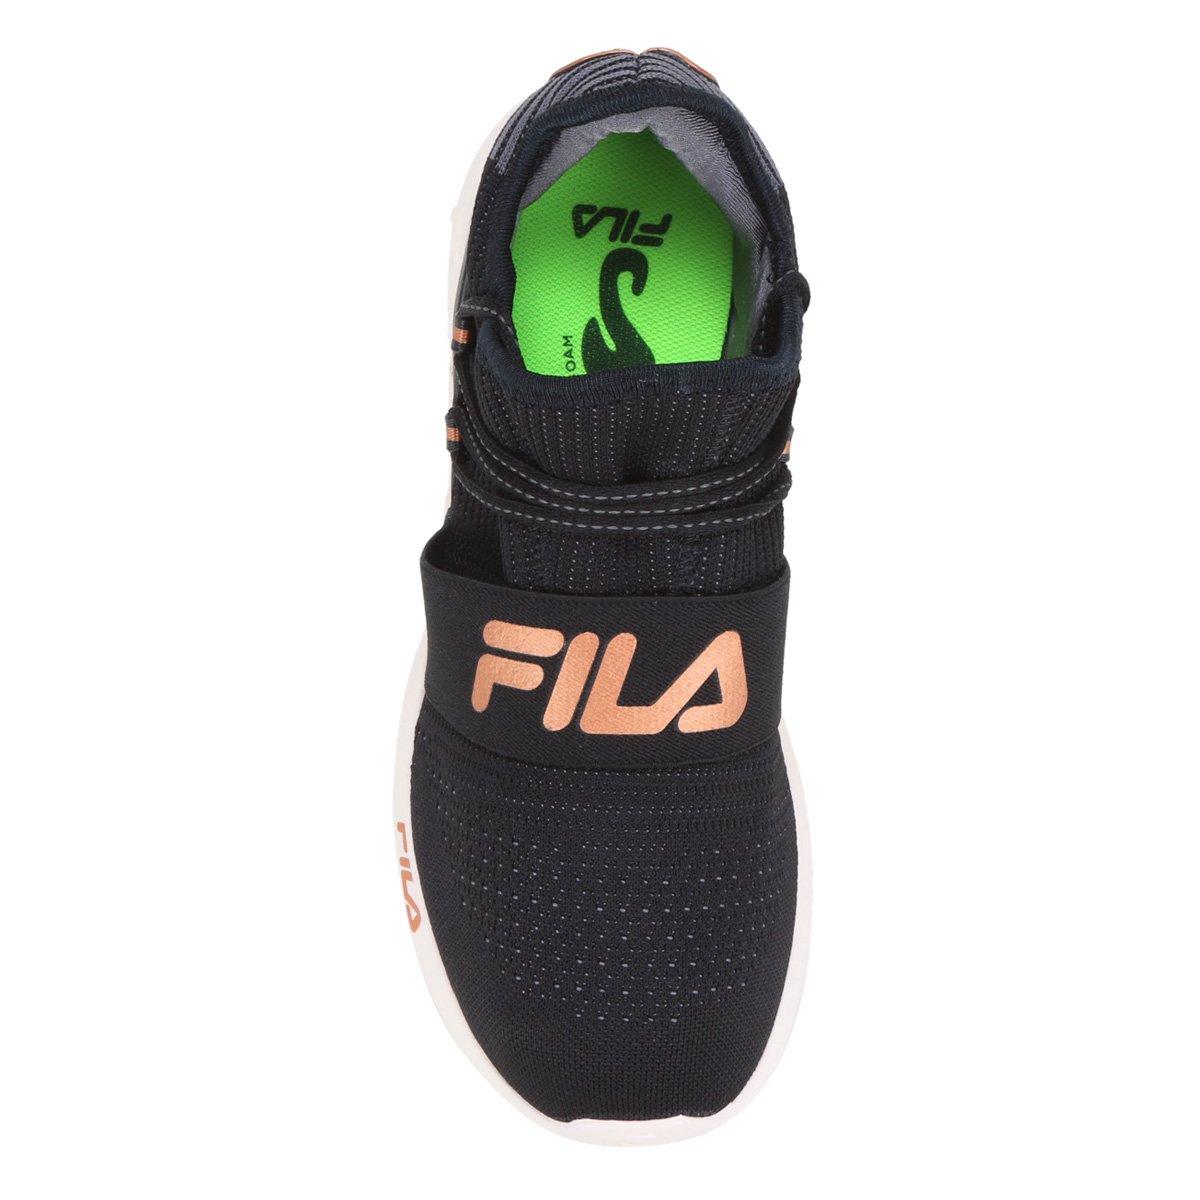 Tênis Fila Trend 2.0 Feminino - Preto+Grafite